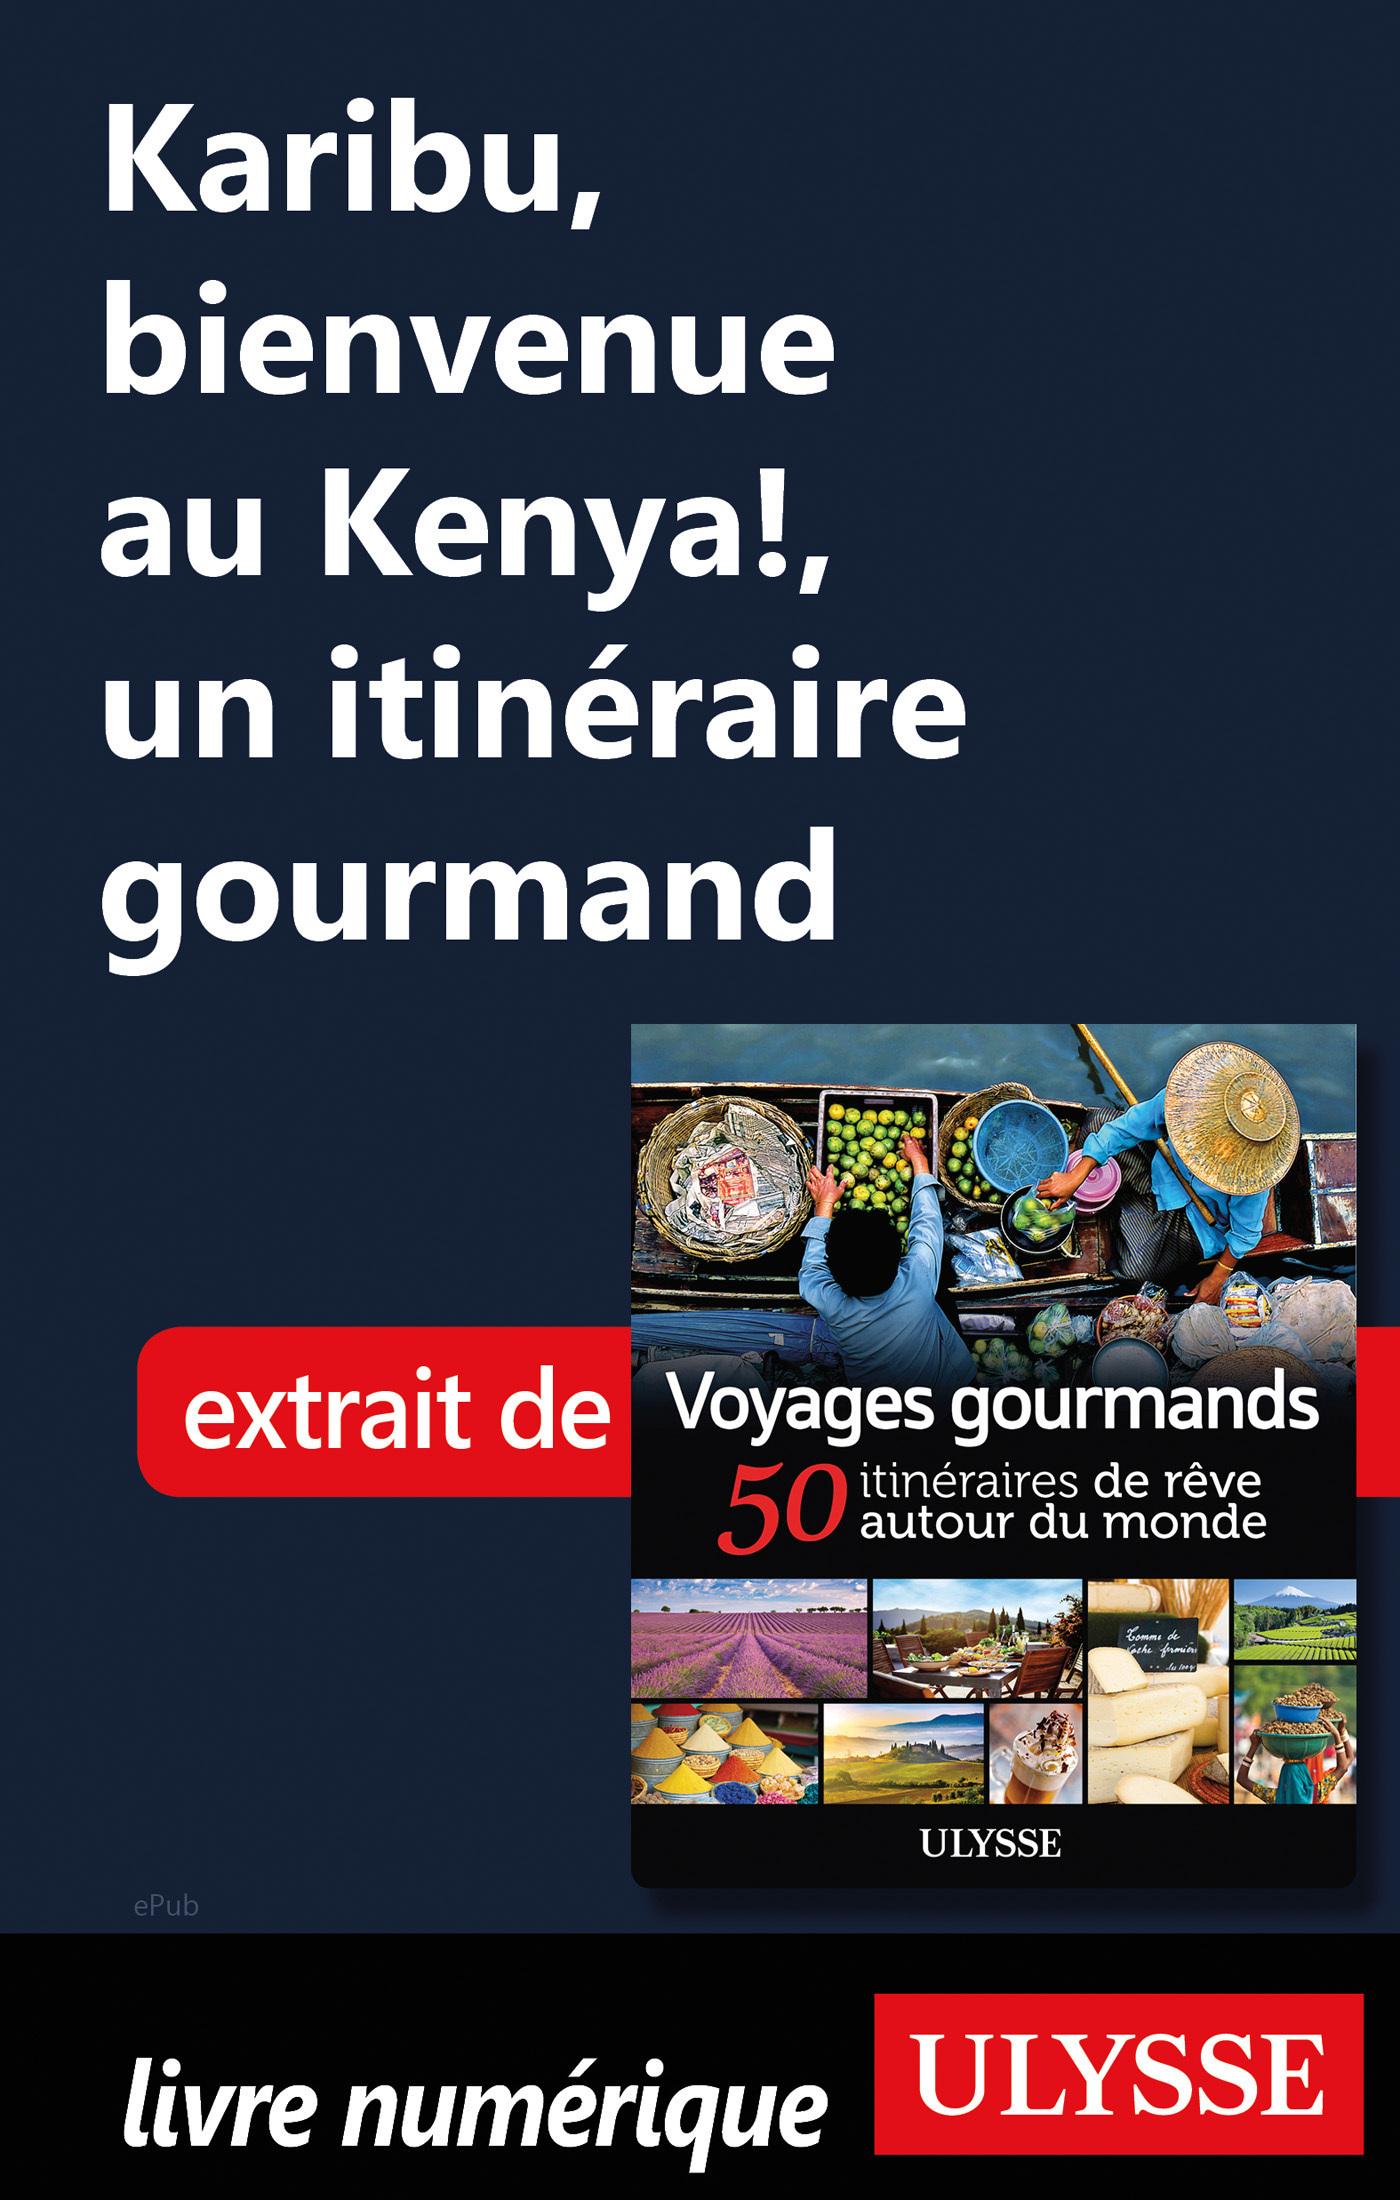 Karibu, bienvenue au Kenya ! - Un itinéraire gourmand